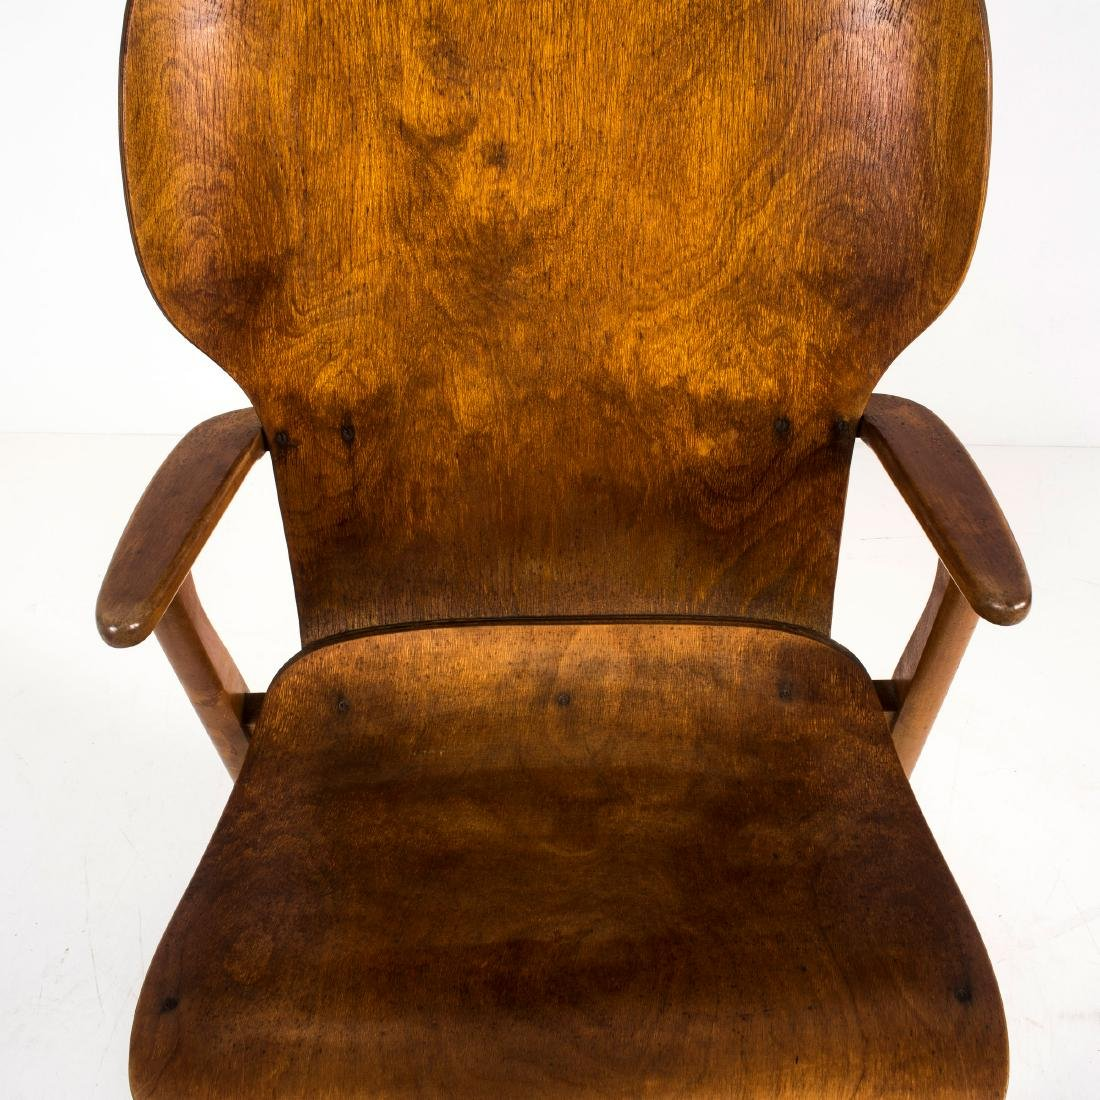 Armchair 'Domus Lux', c1948 - 2